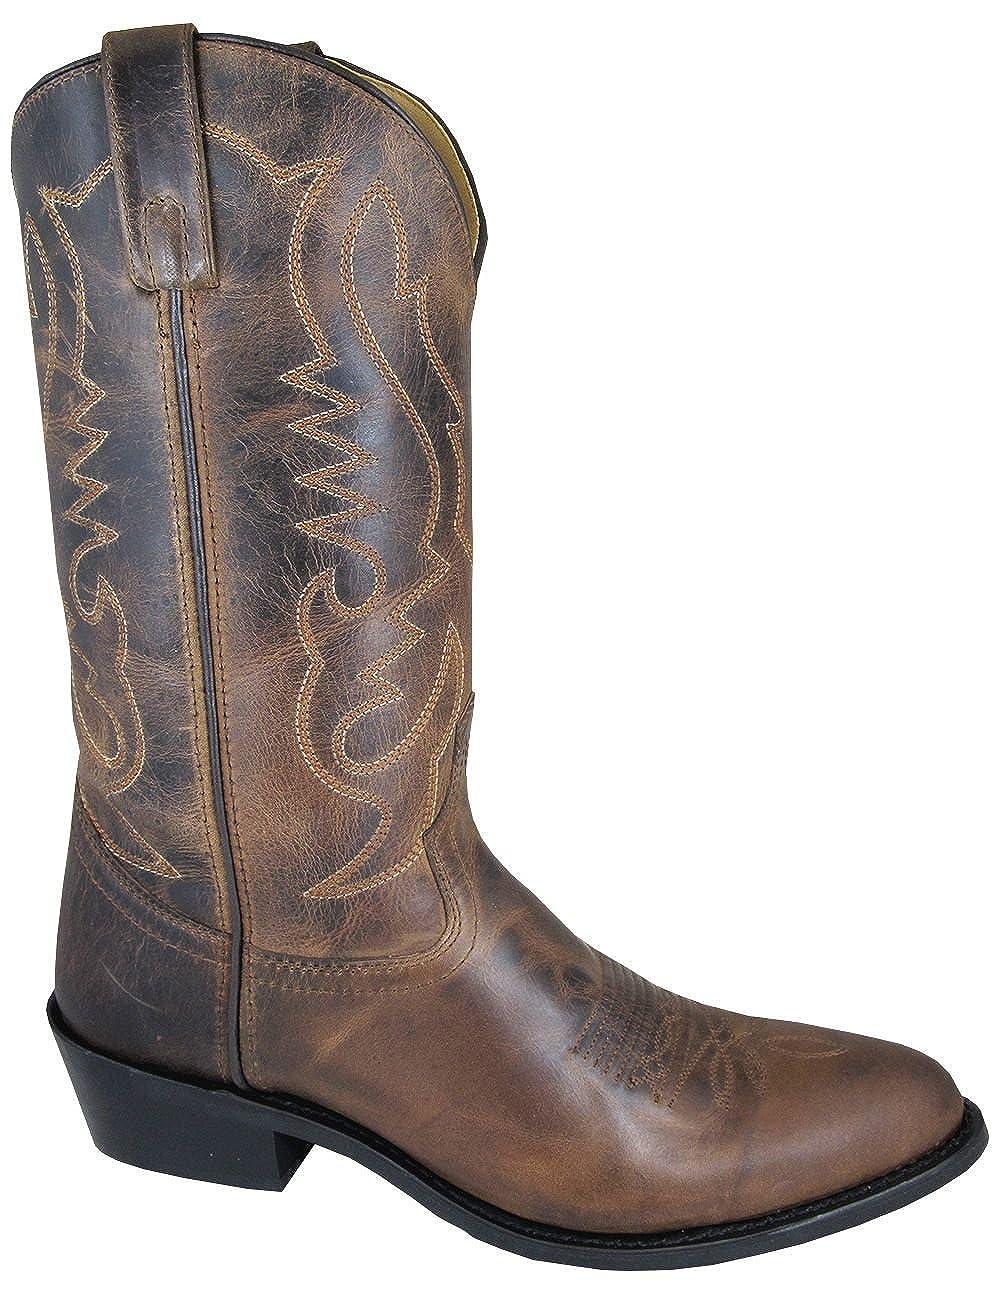 Smoky Mountain Mens Denver Round Toe Boots SMOKY MOUNTAIN BOOTS INC